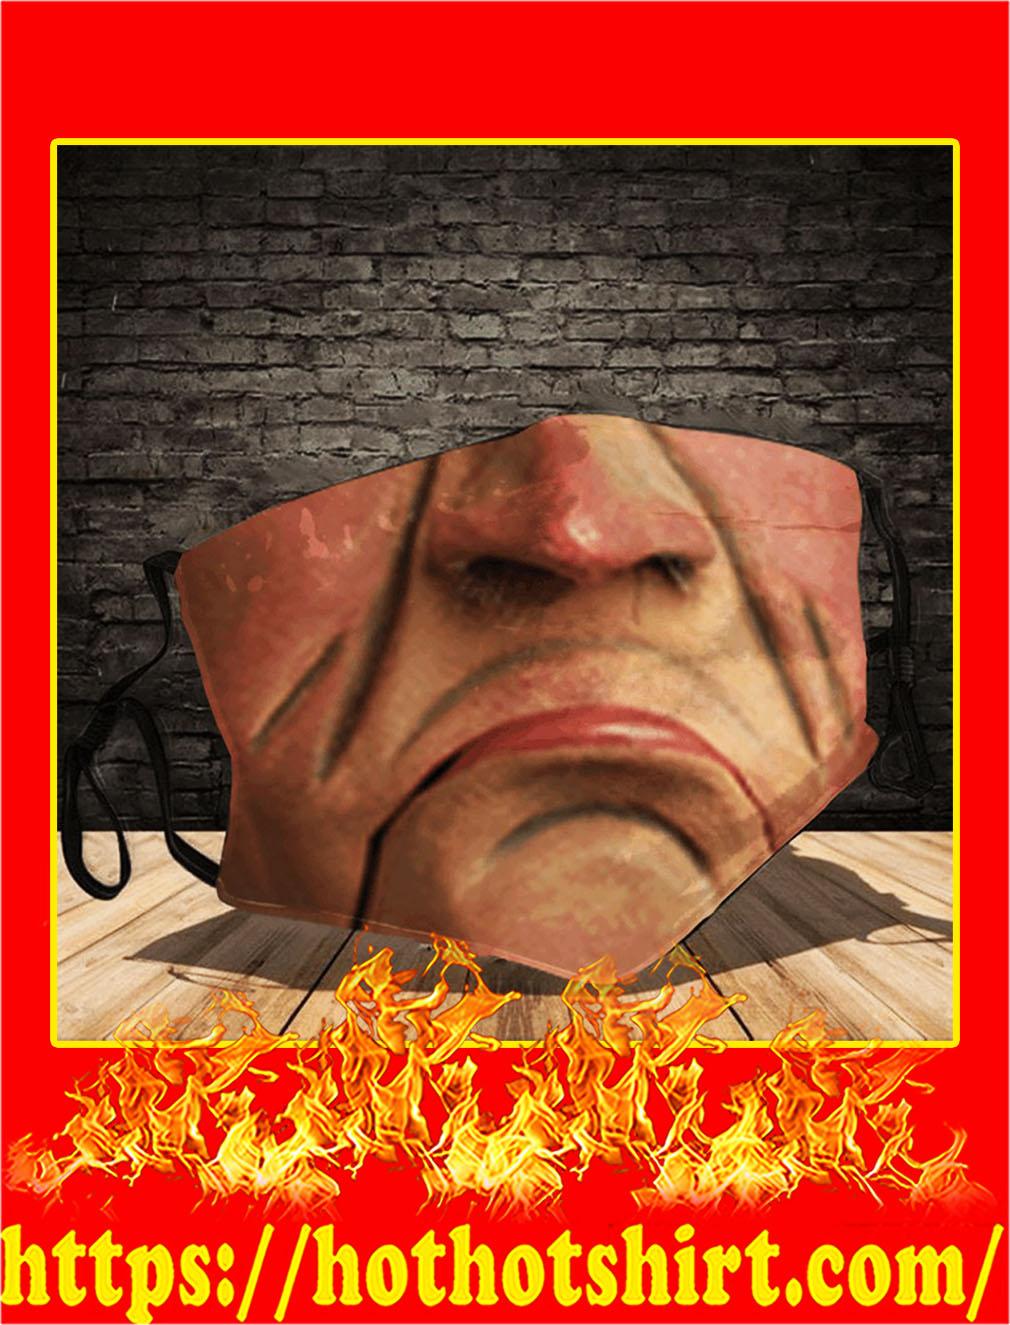 Jeff dunham walter face mask- pic 1